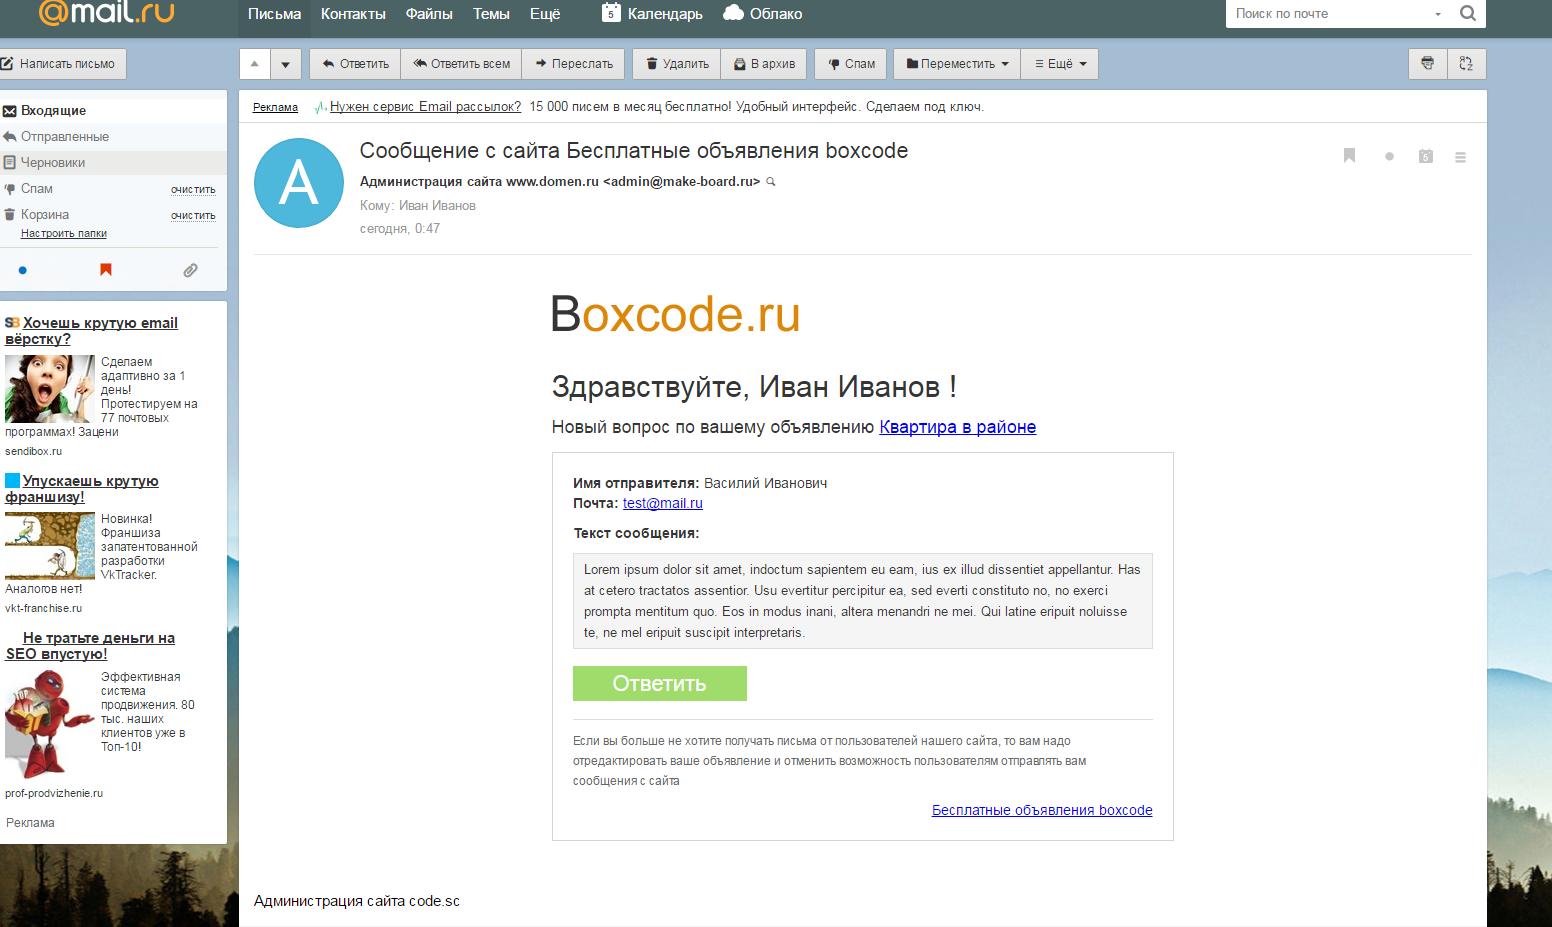 Шаблон html-писем для Boxcode — Make-Board.ru   Создание доски ... f07b47fdeba